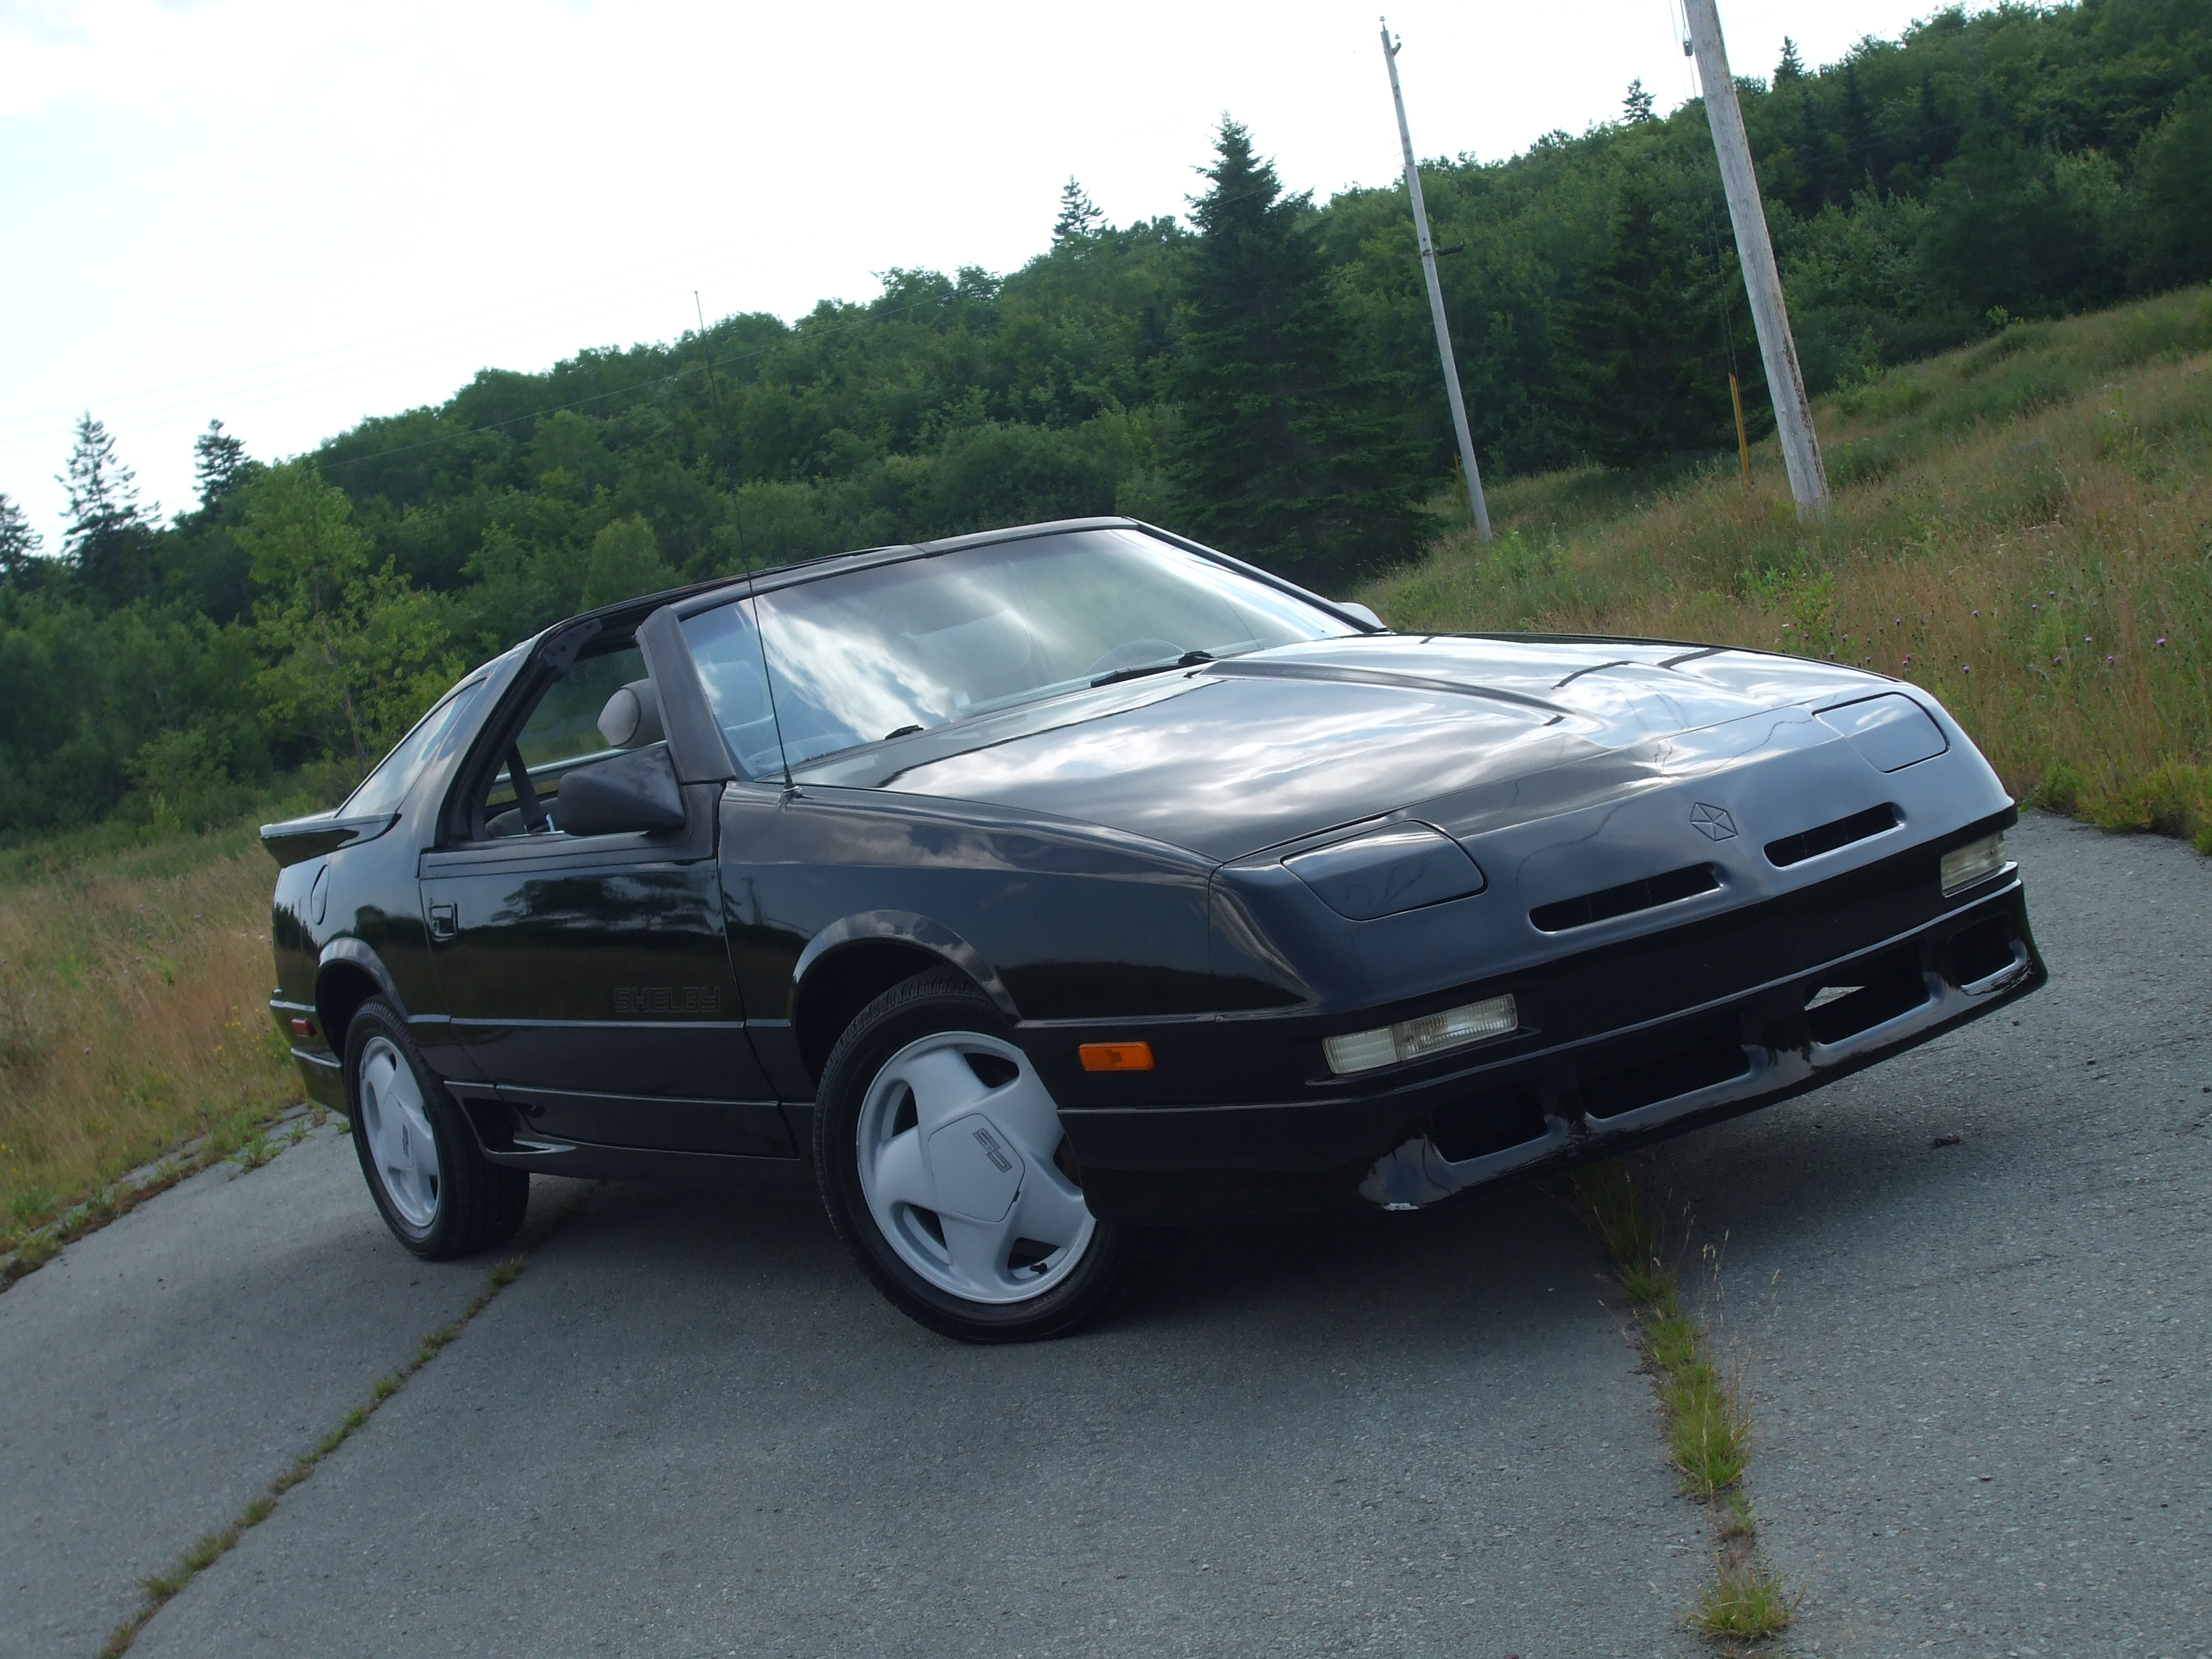 1989 Dodge Daytona Shelby